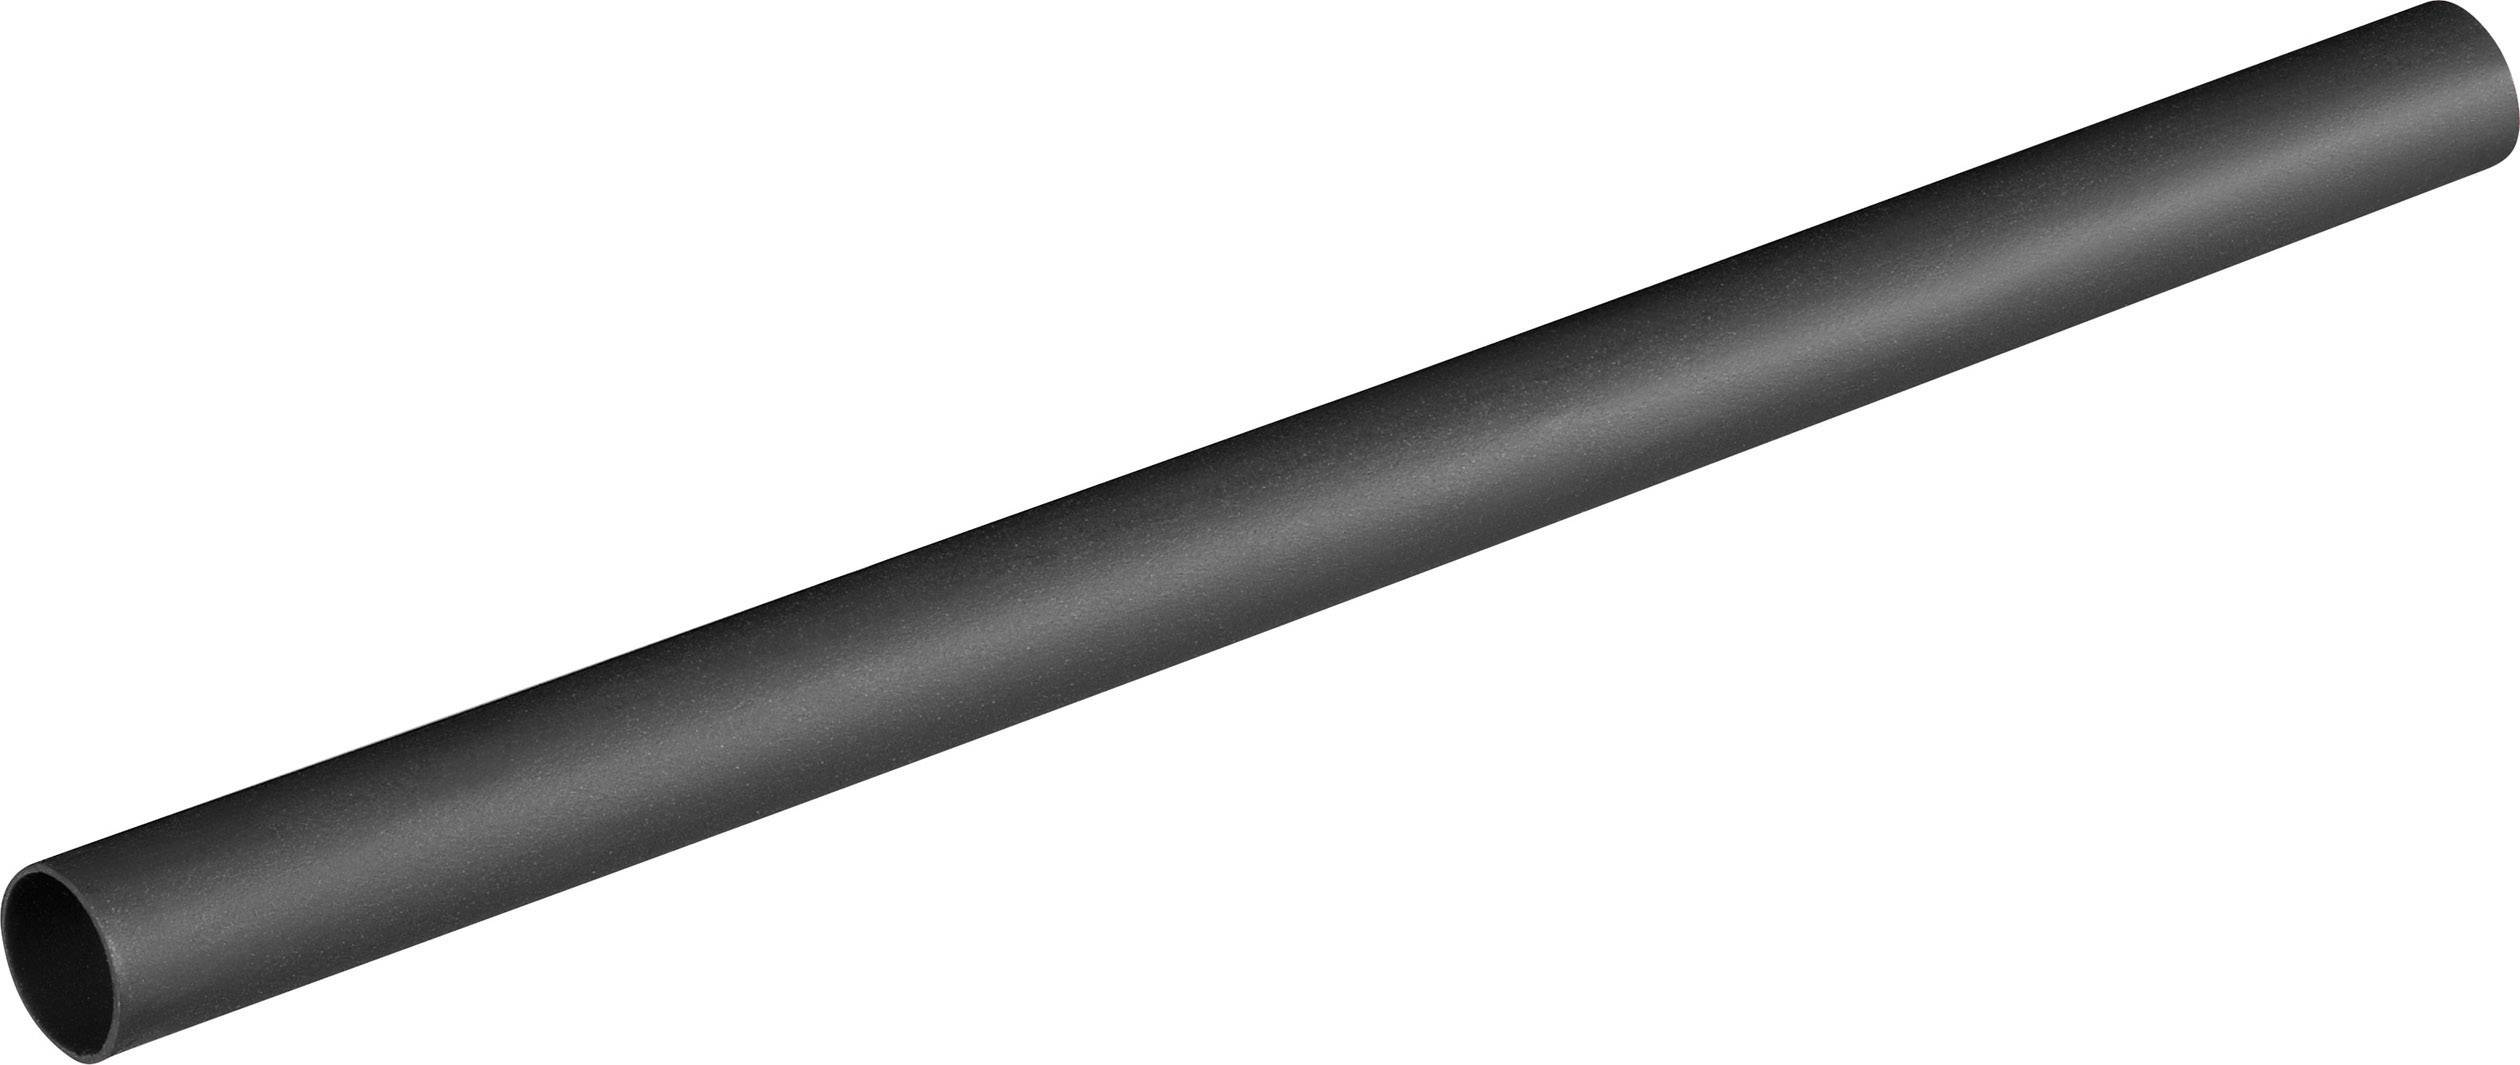 Zmršťovacie bužírky nelepiace AlphaWire F221 3/8 BK, 2:1, 10 mm, čierna, 1.2 m